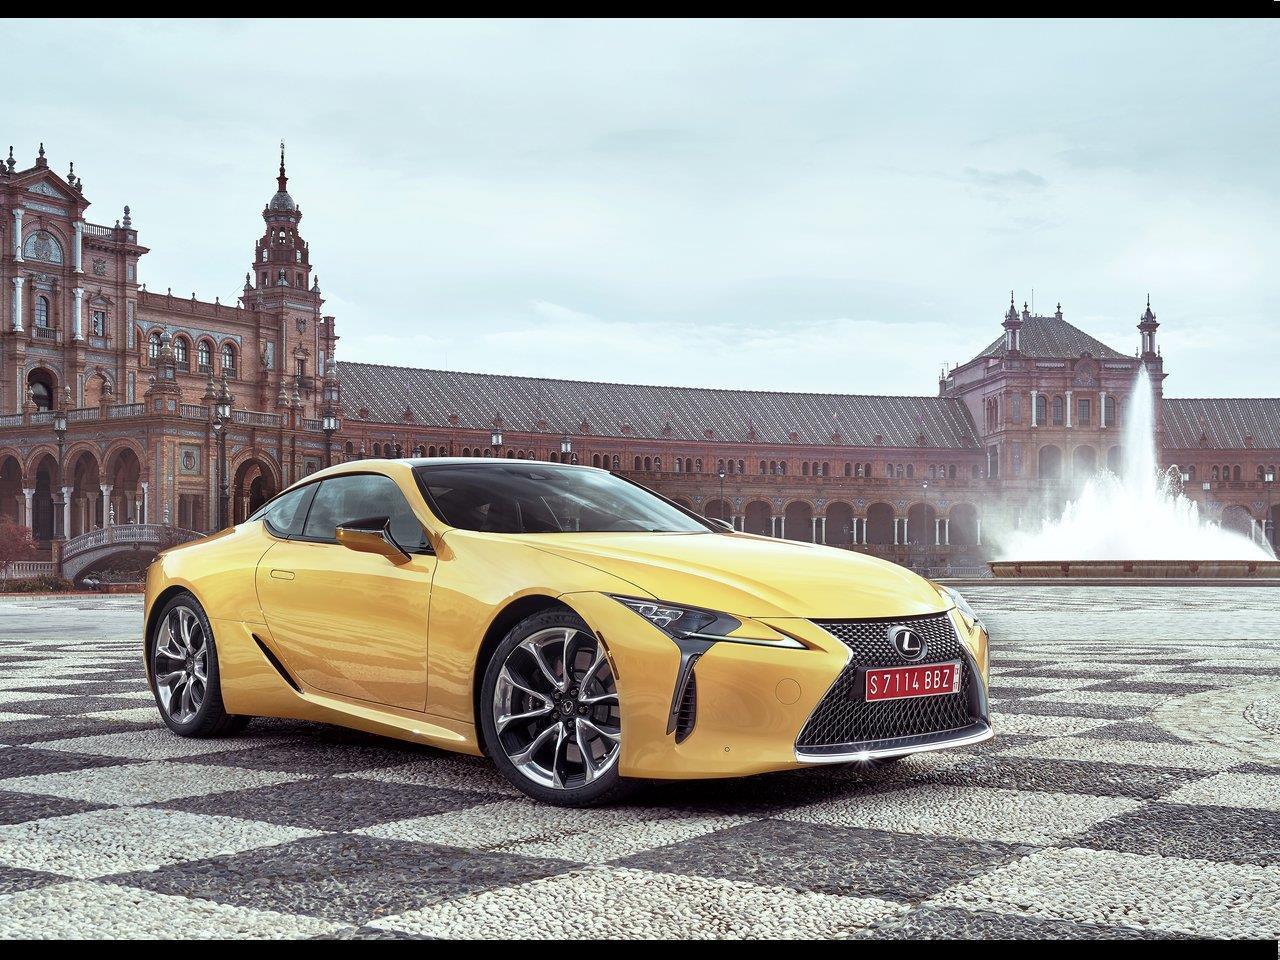 Lexus Lc500 Laptimes Specs Performance Data Fastestlaps Com